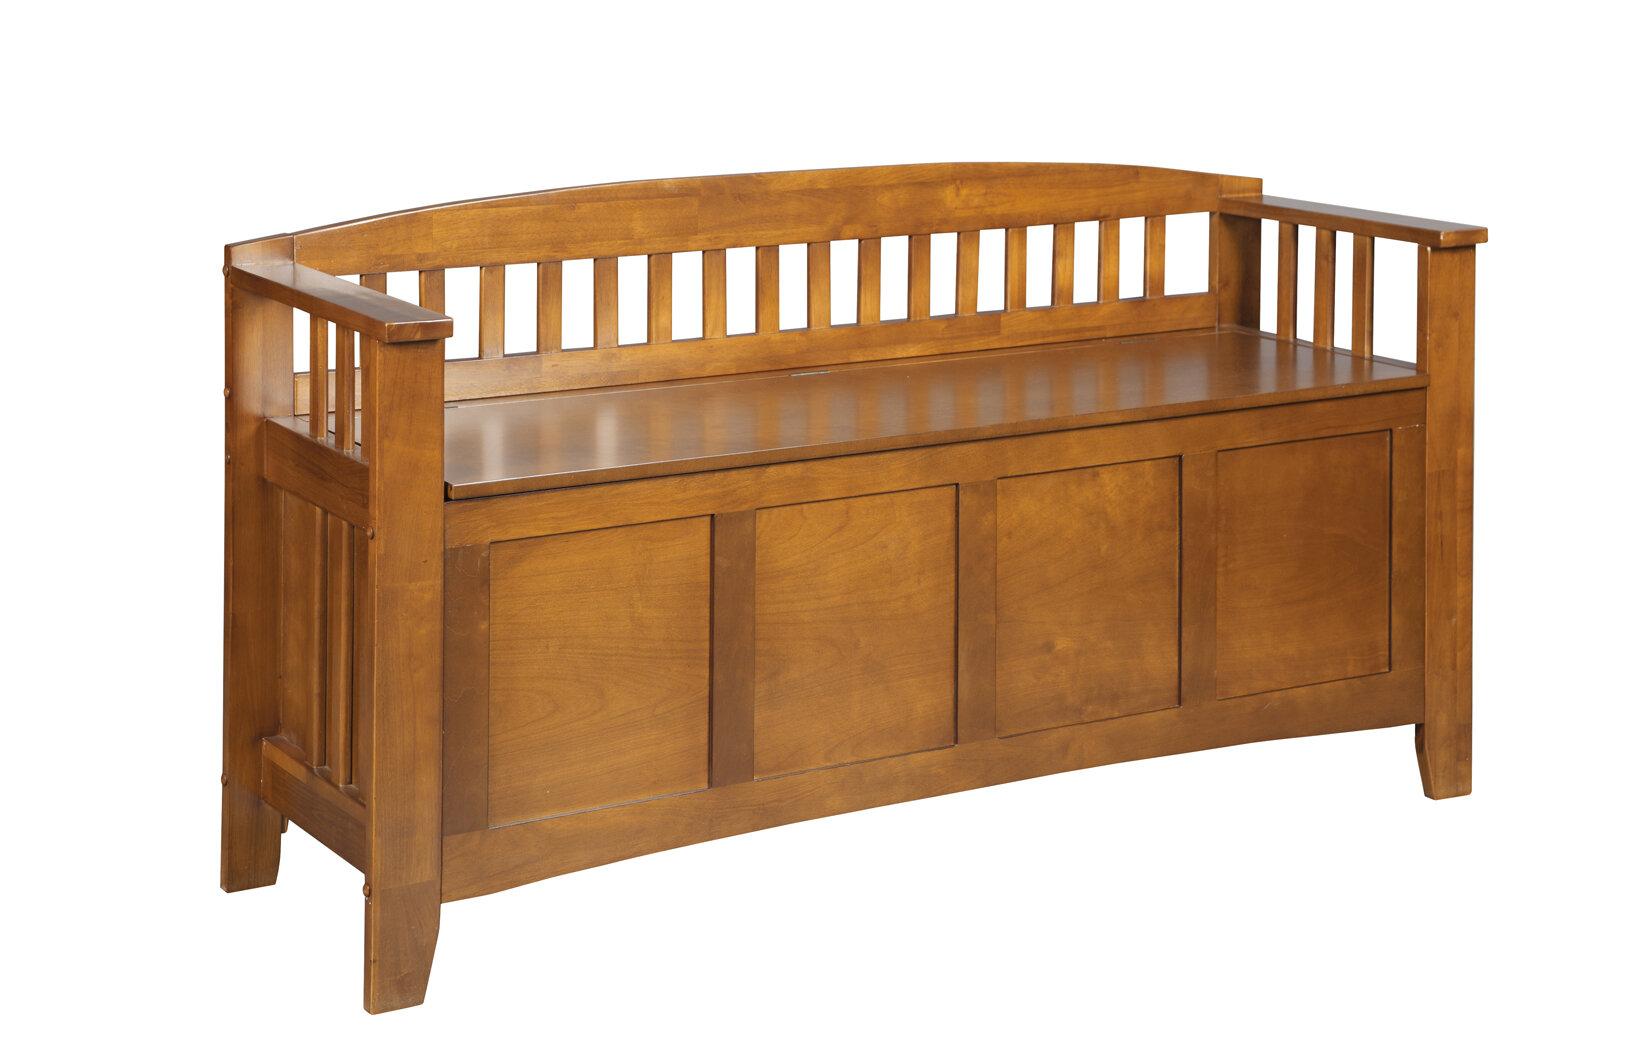 American Furniture Classics Wood Storage Bench Reviews Wayfair